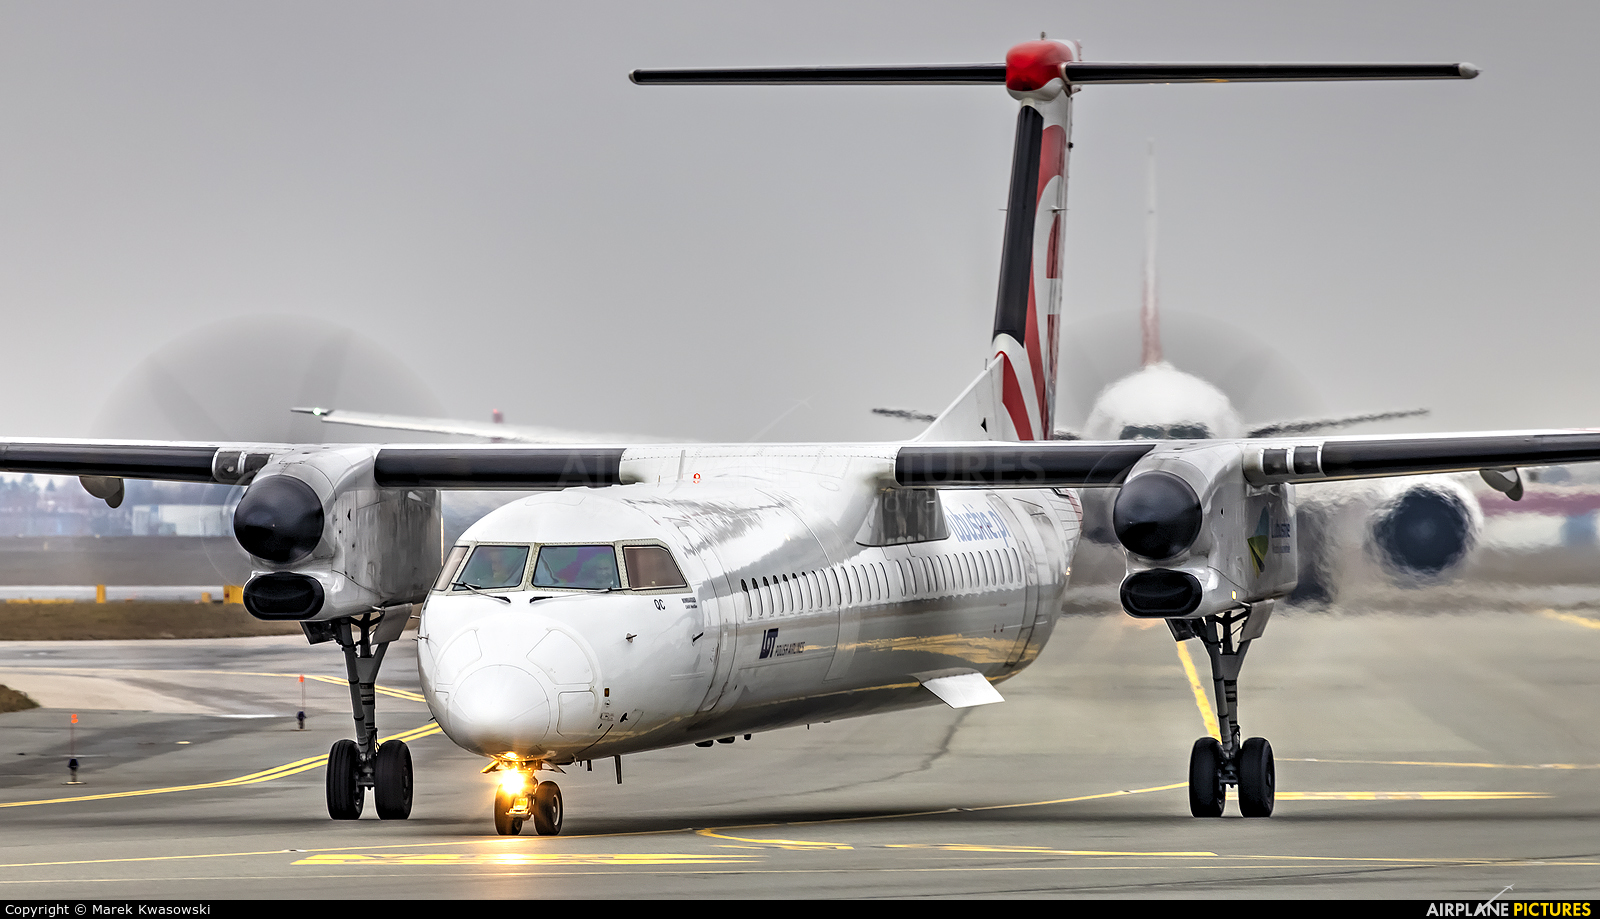 LOT - Polish Airlines SP-EQC aircraft at Warsaw - Frederic Chopin